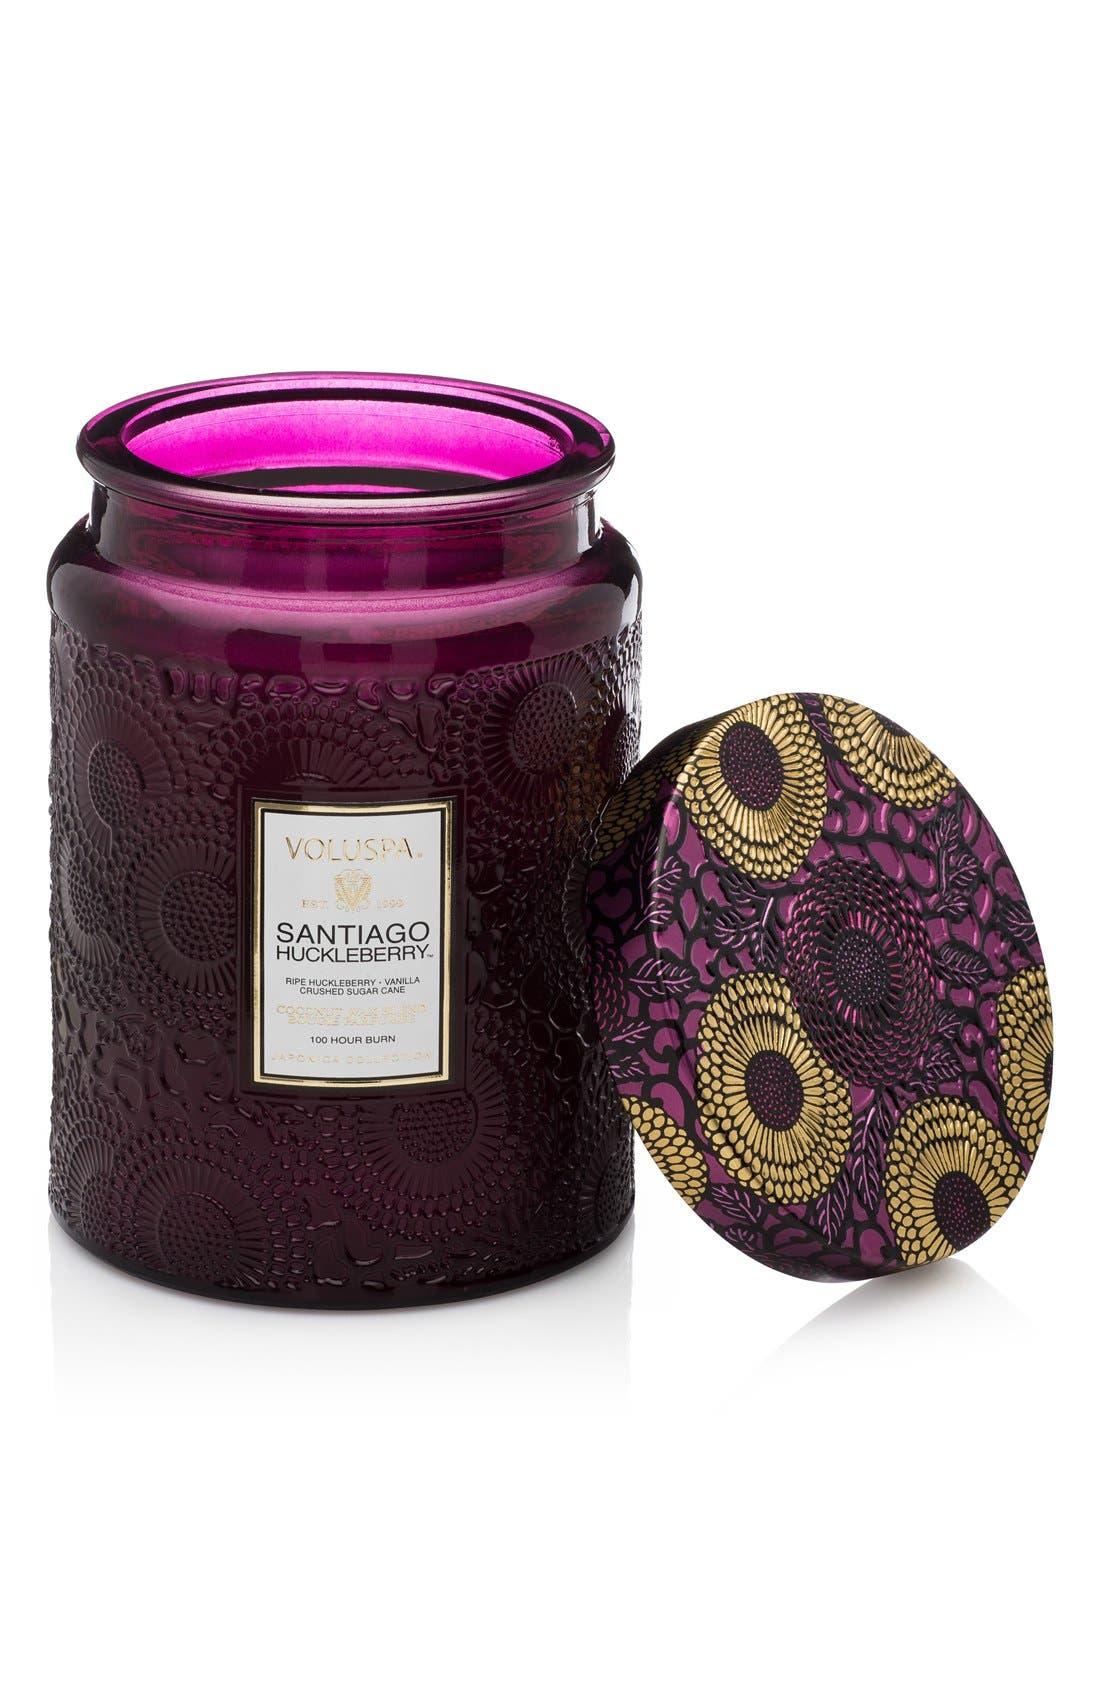 Main Image - Voluspa Japonica Santiago Huckleberry Large Jar Candle